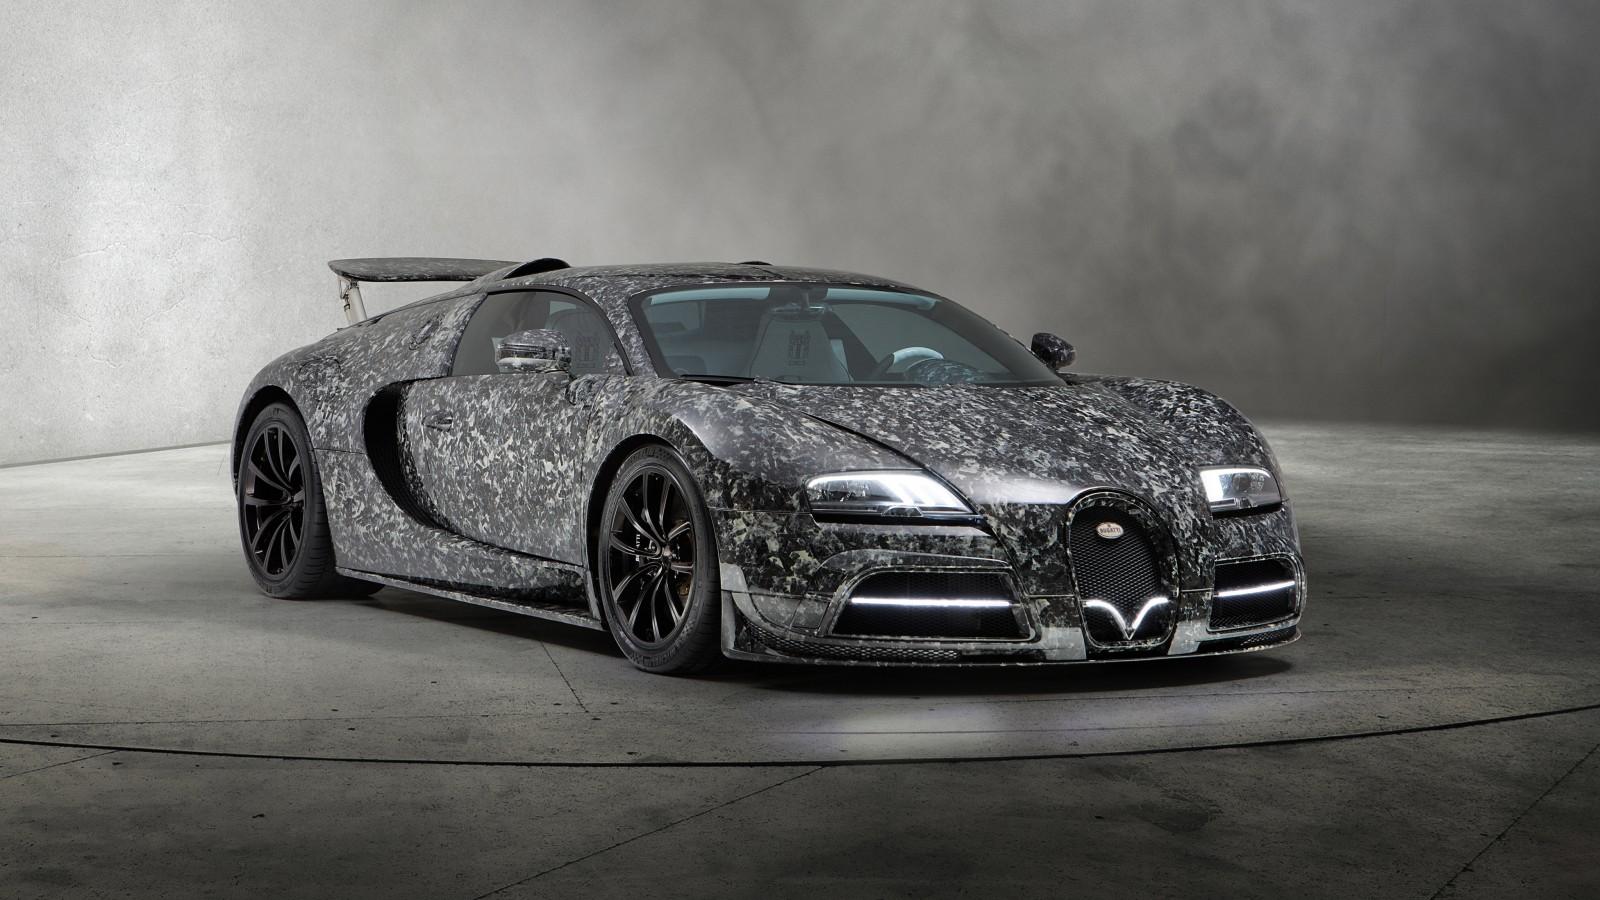 2018 Mansory Bugatti Veyron Vivere Diamond Edition 4K Wallpaper   HD Car Wallpapers   ID #9961